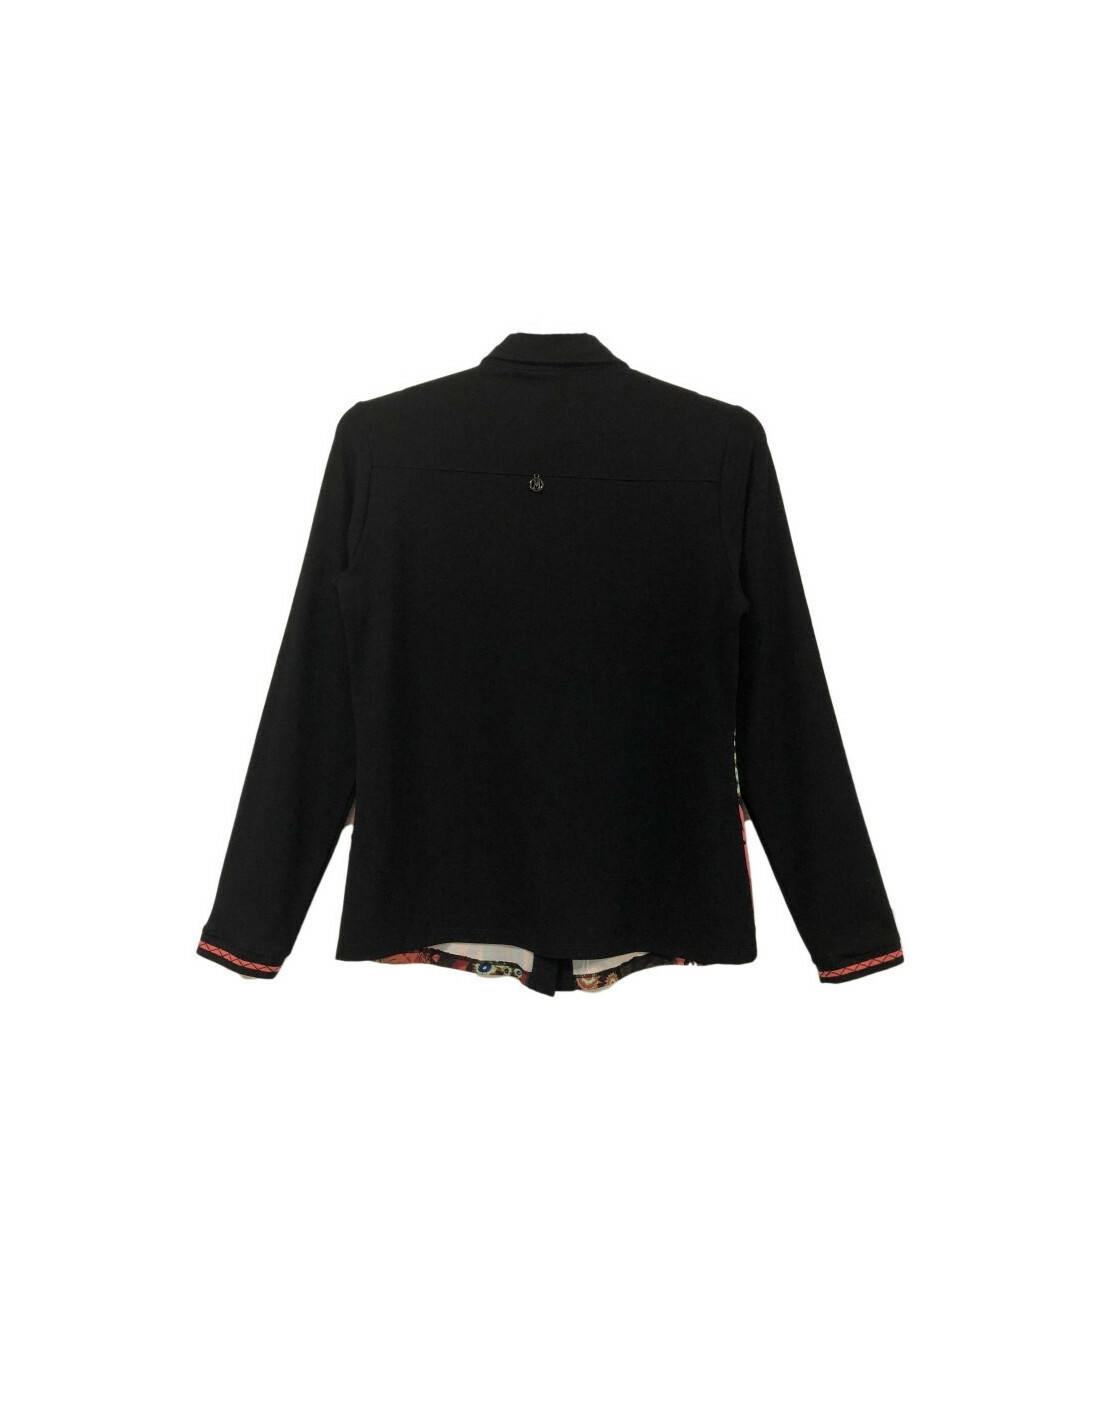 Maloka: Sedona Rock Art Buttoned Down Shirt (Few Left!)